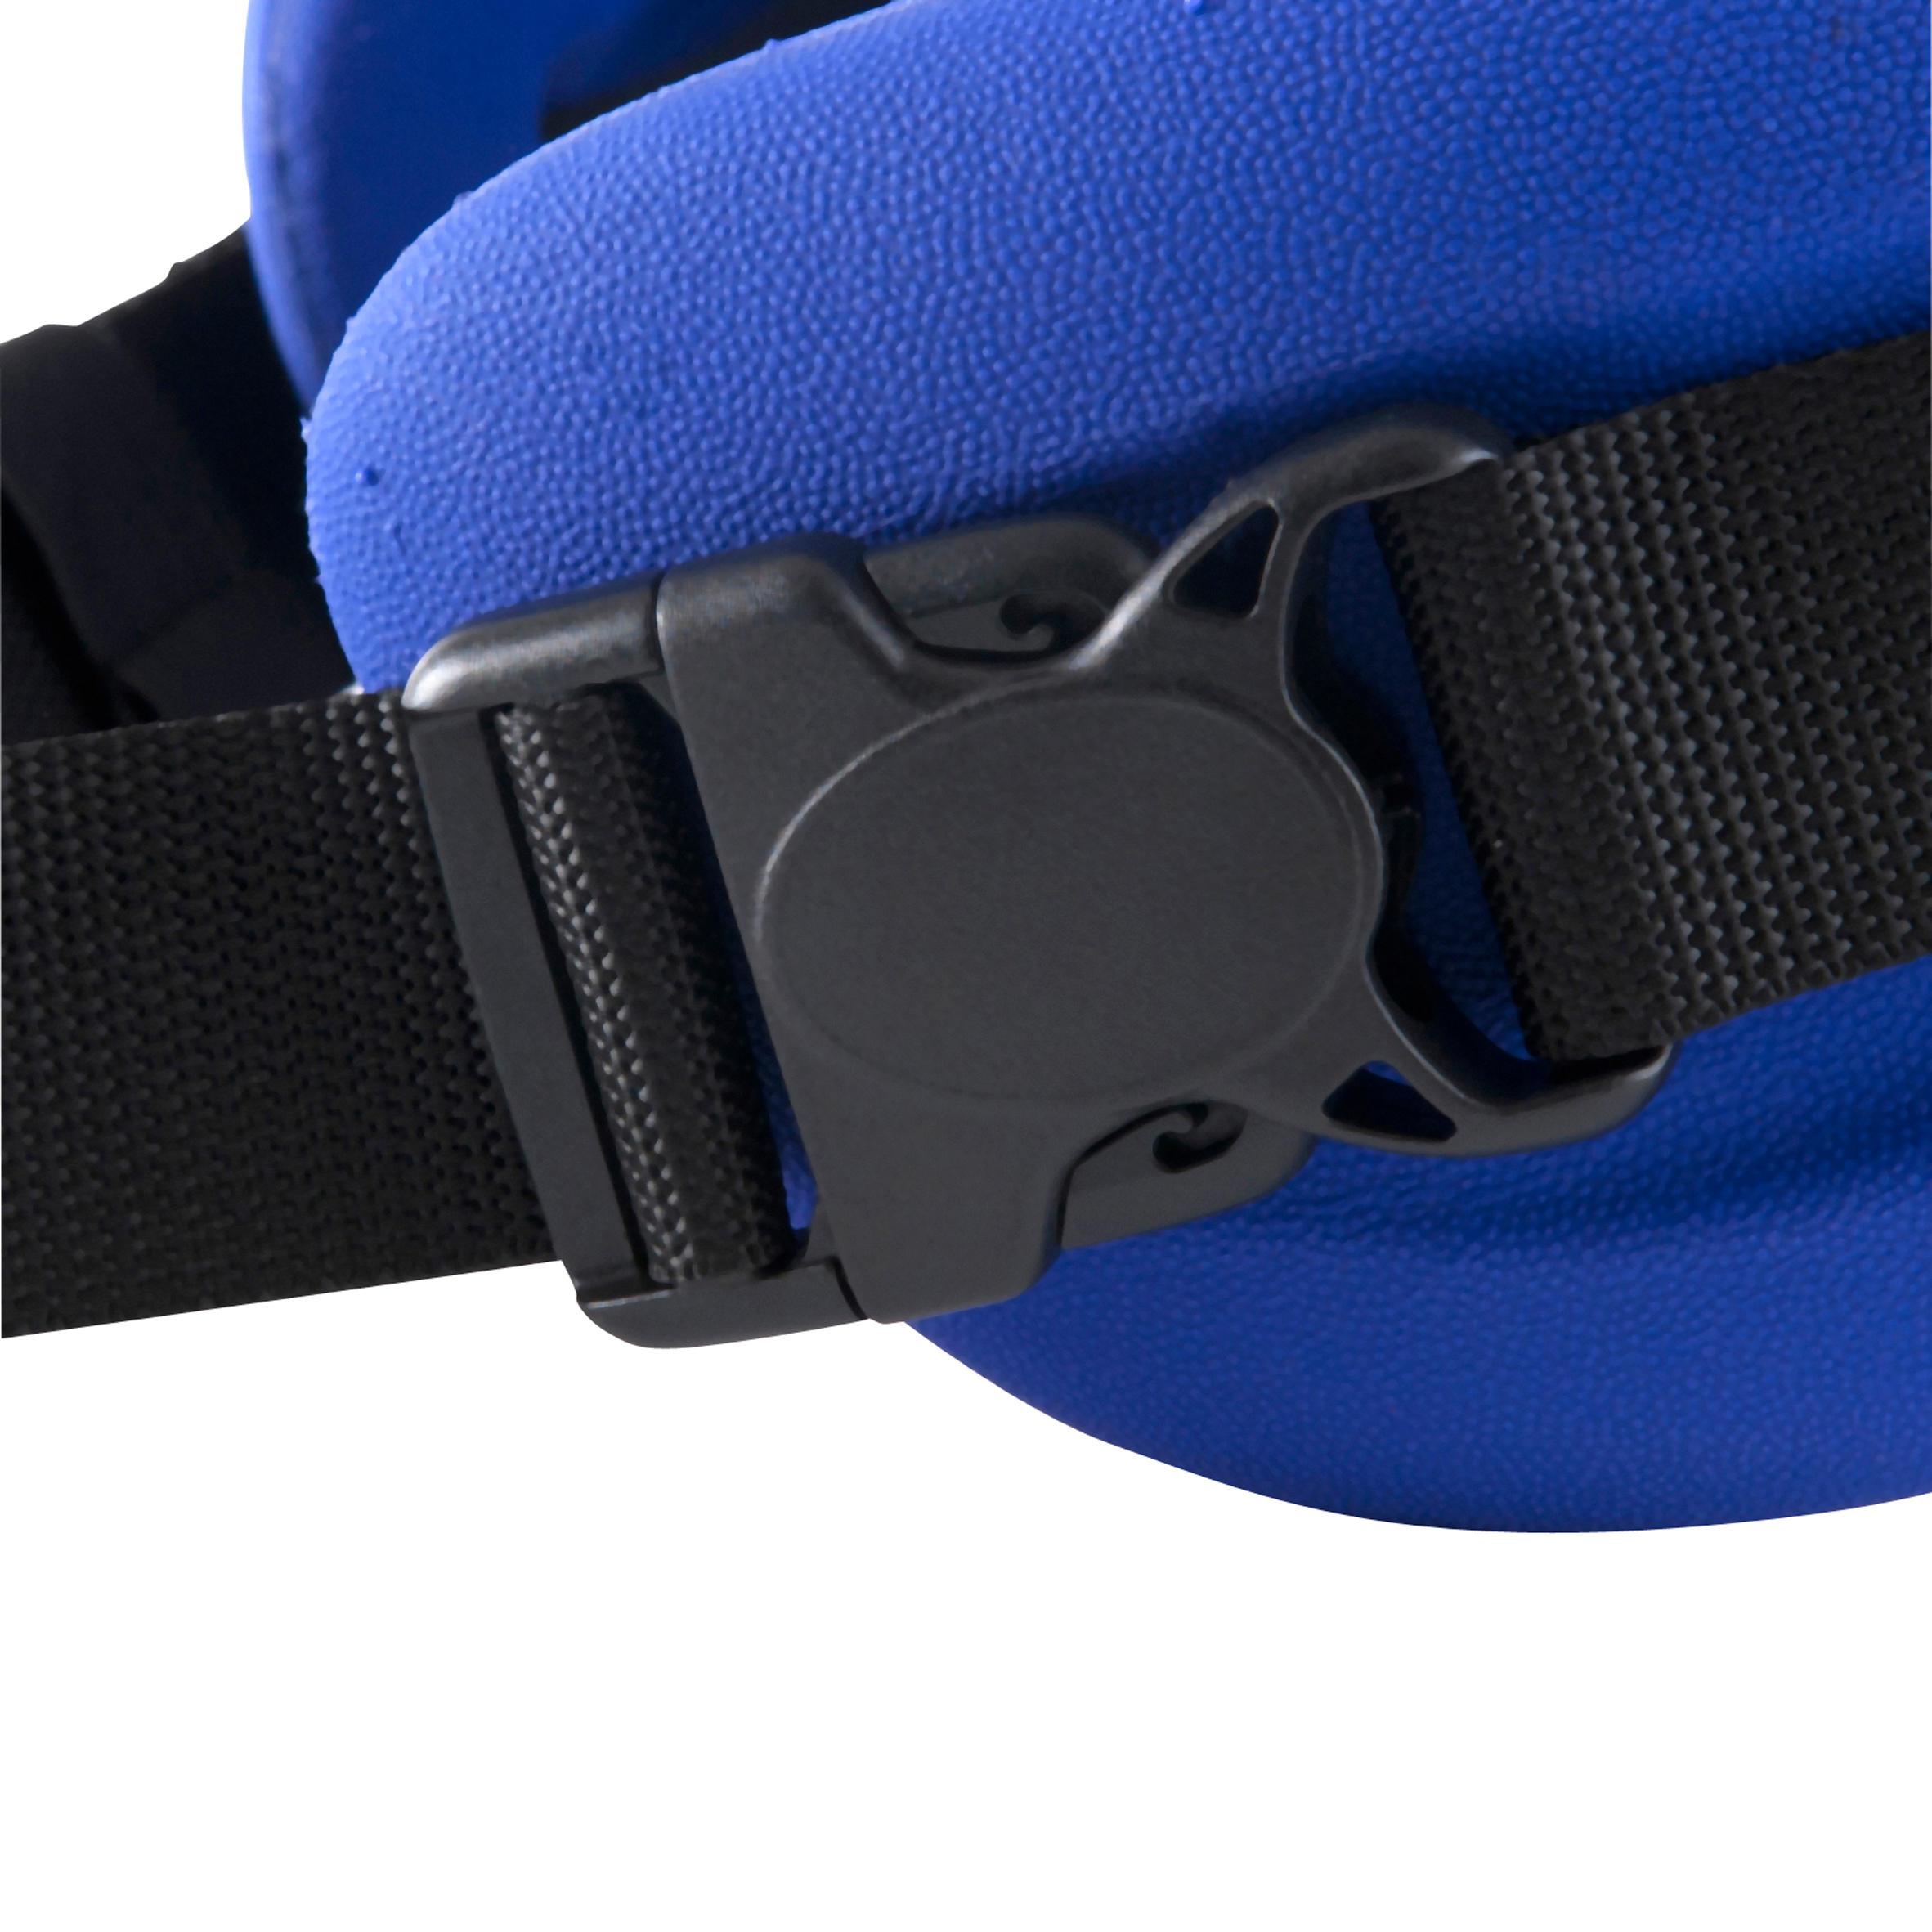 AQUABELT Aquafitness Buoyancy Belt - Blue